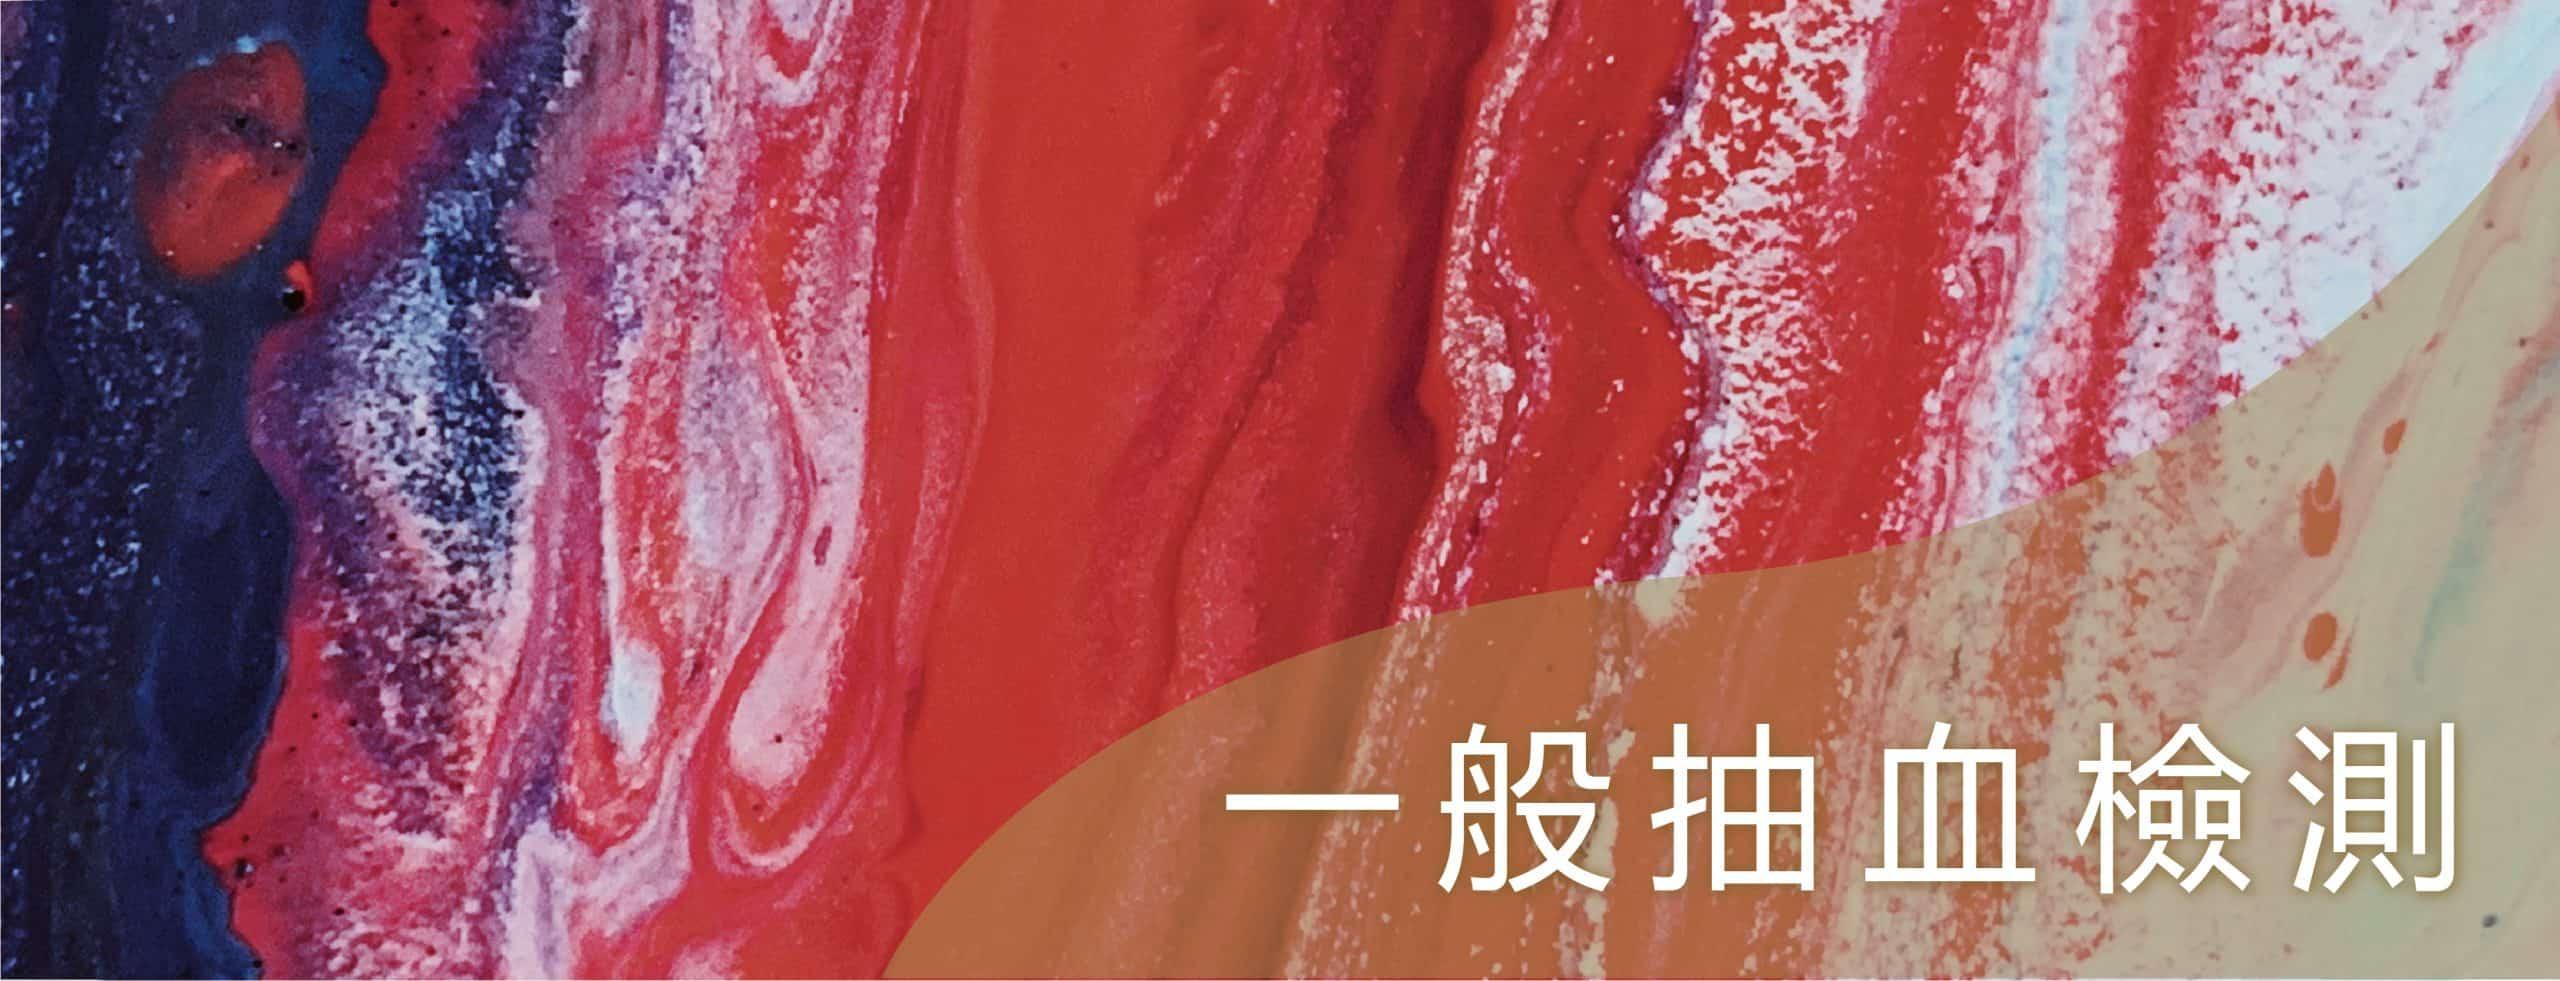 一般血液檢測 Banner 02 1 scaled